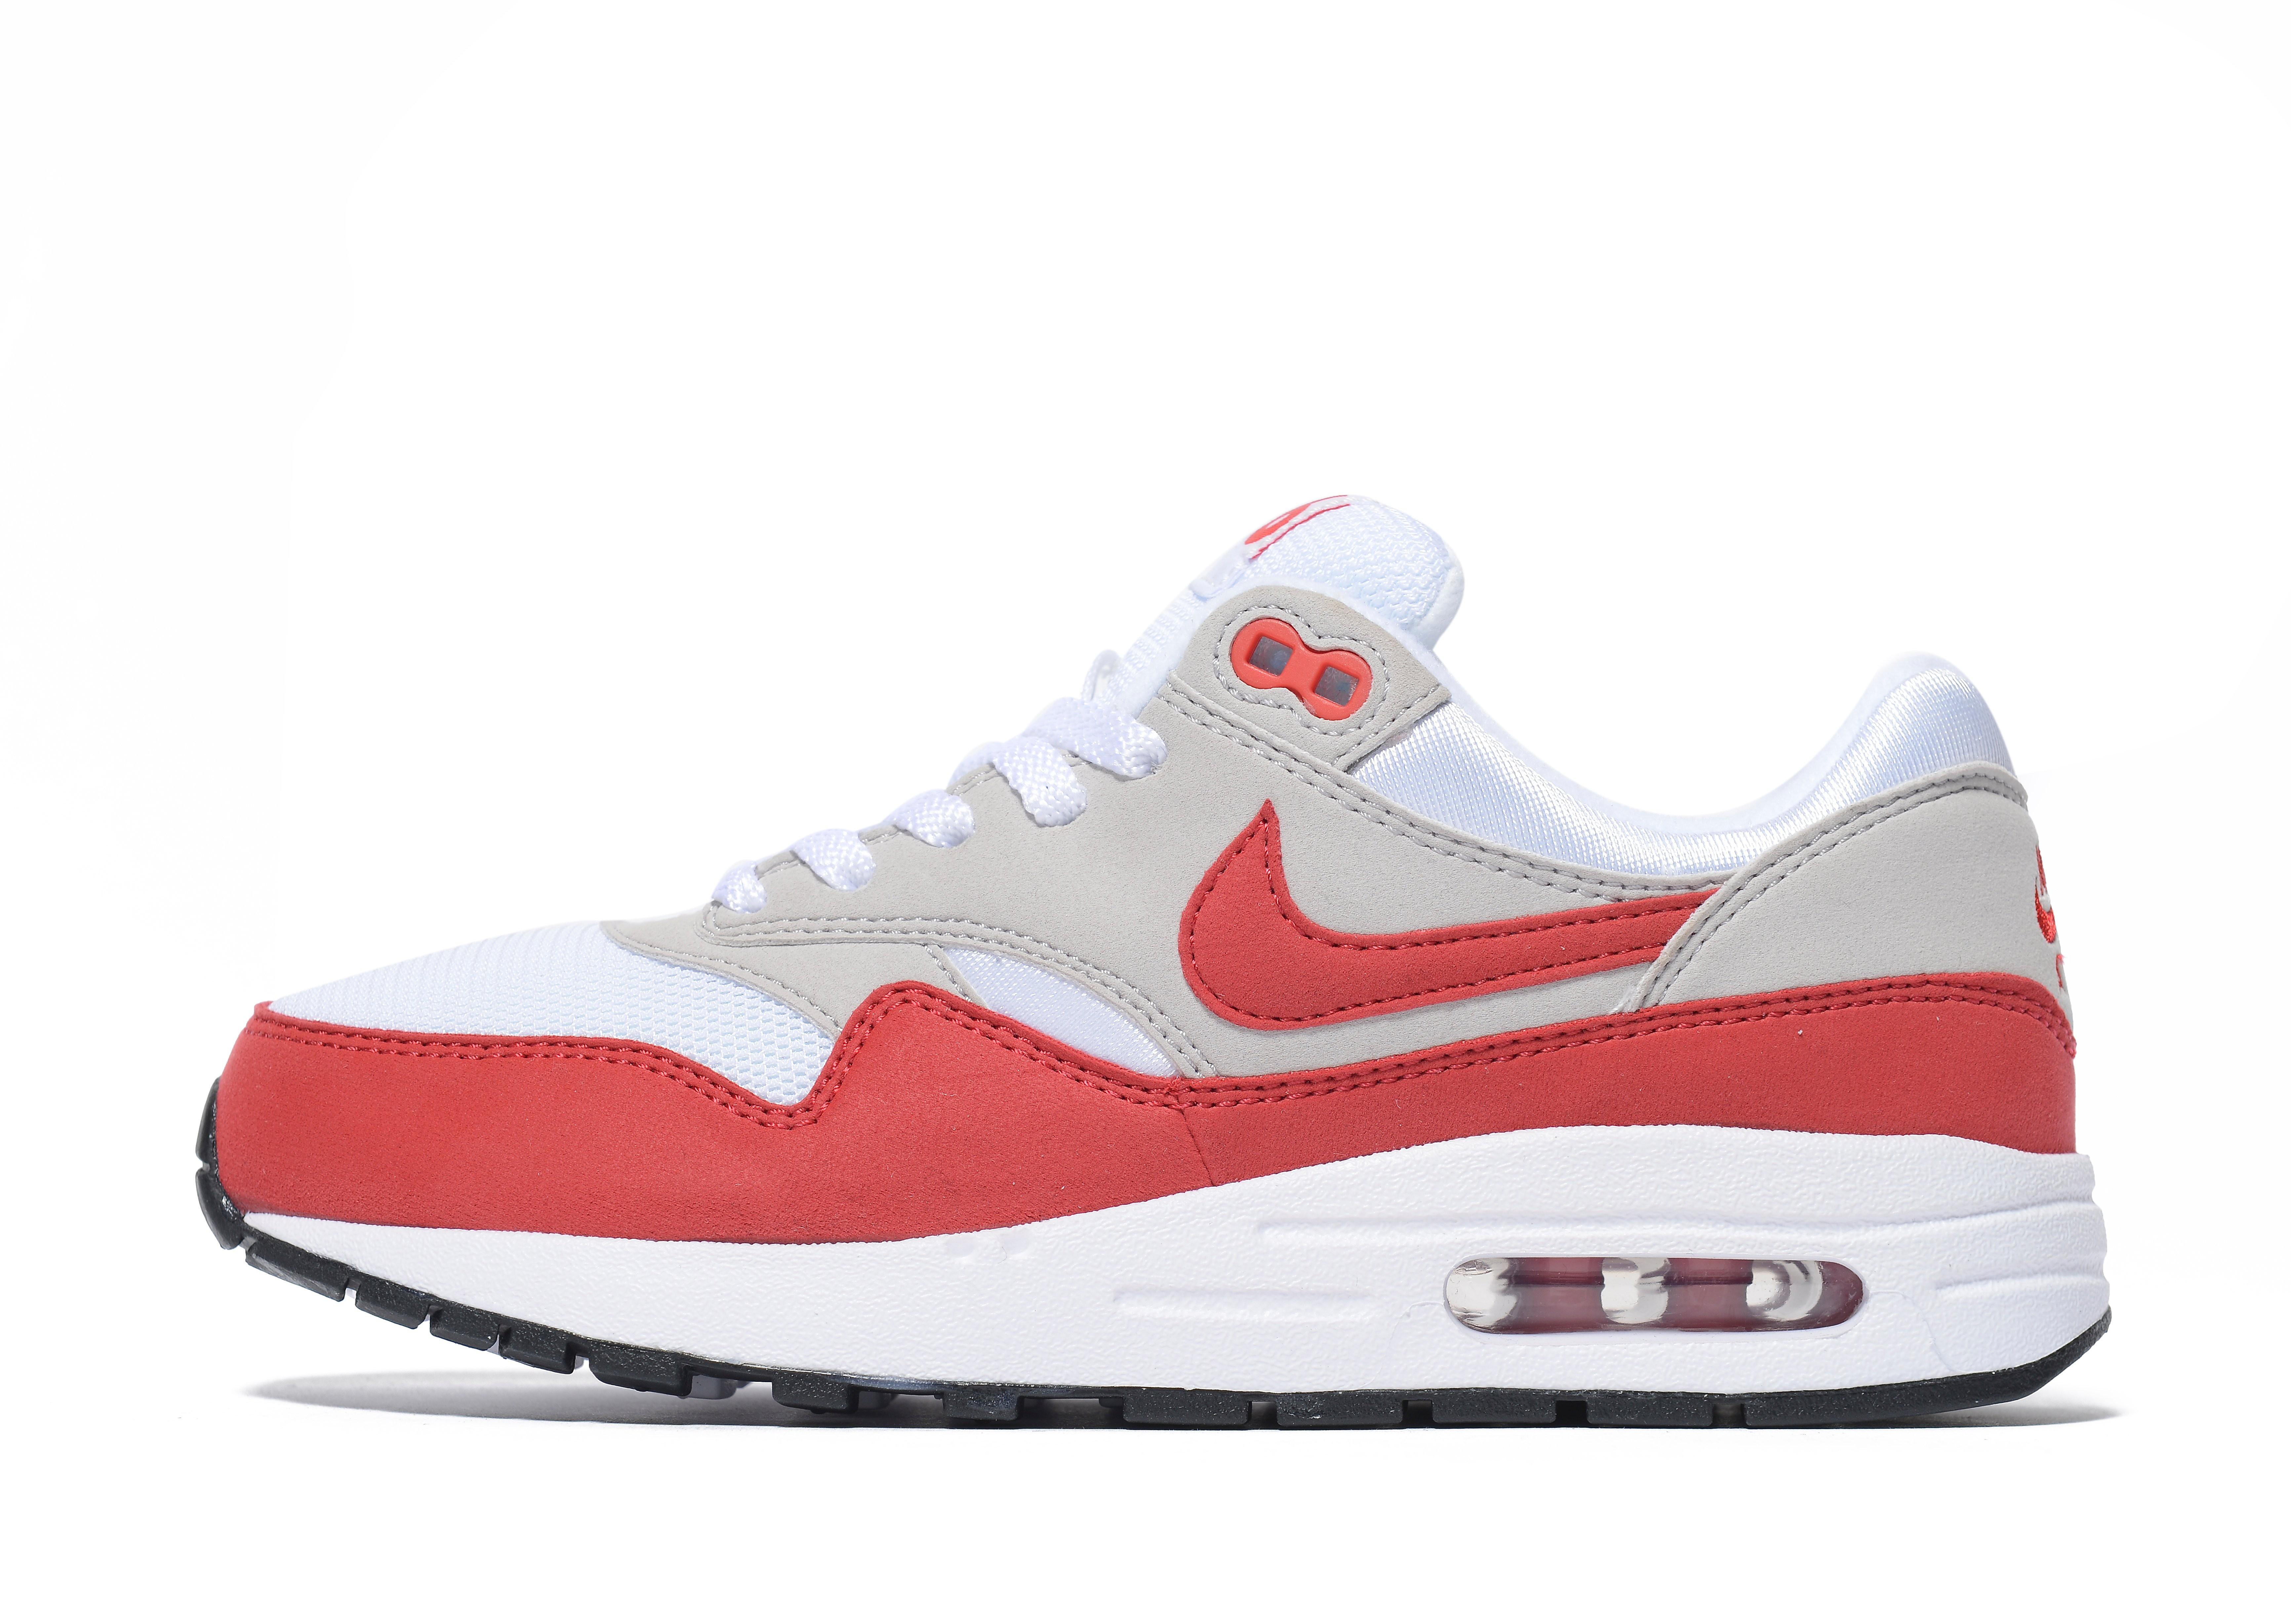 nike roshe boys sports authority buy mens sneakers nz